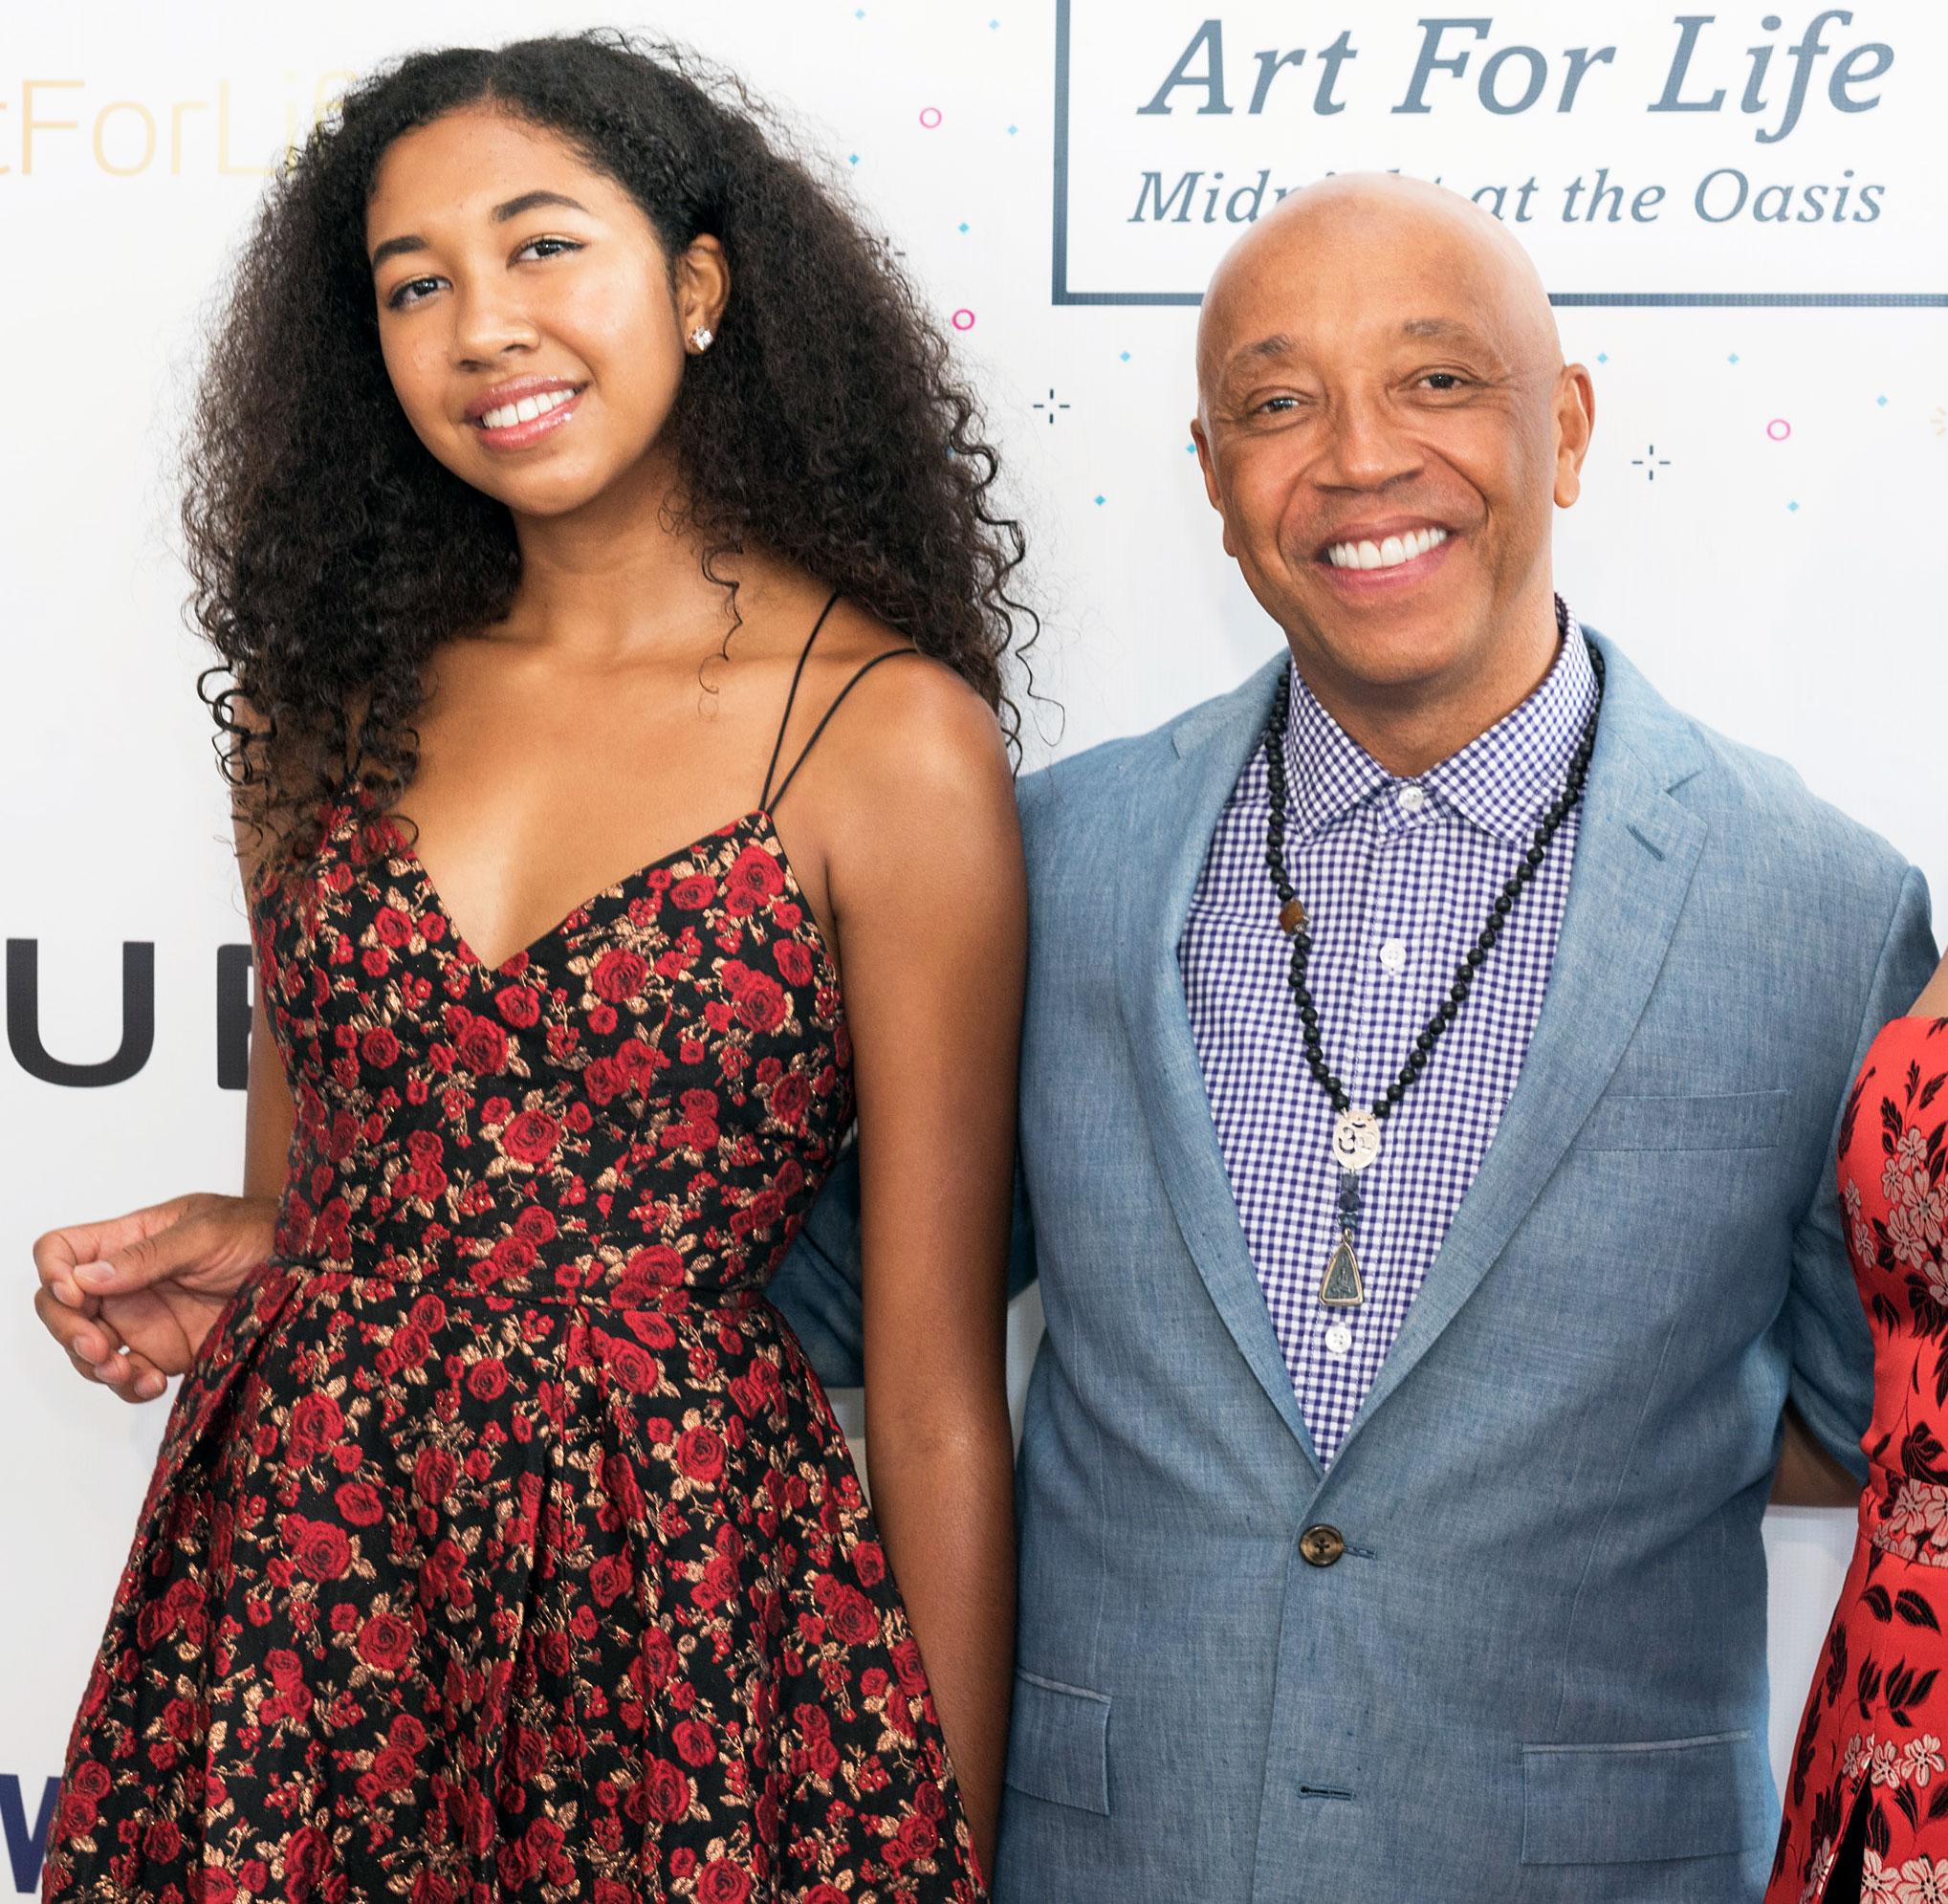 Kimora Lee Simmons' Daughter Aoki, 16, Gets Into Harvard